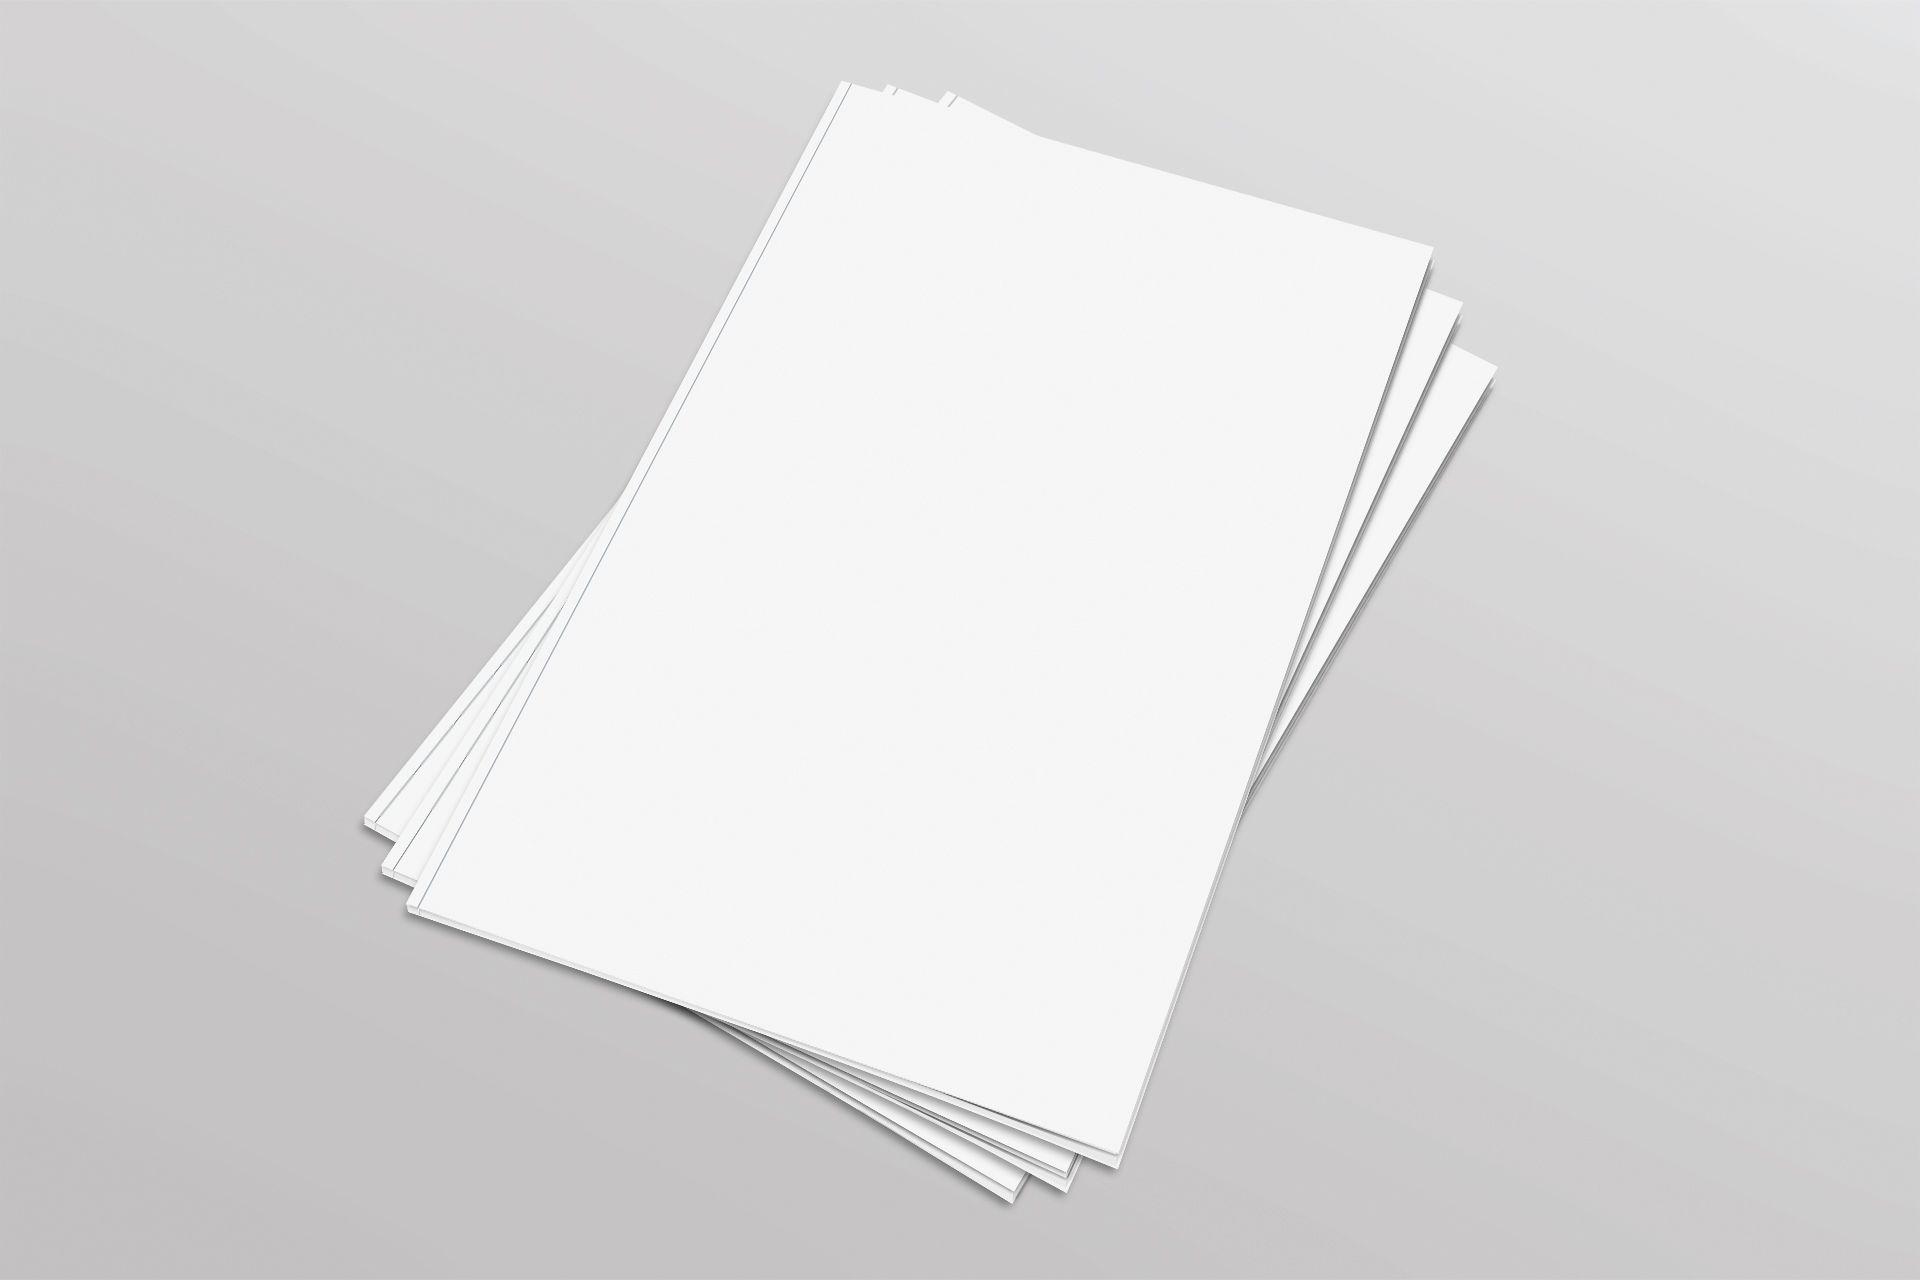 Blank Magazine Pile Pinterest Mockup Mockup Templates